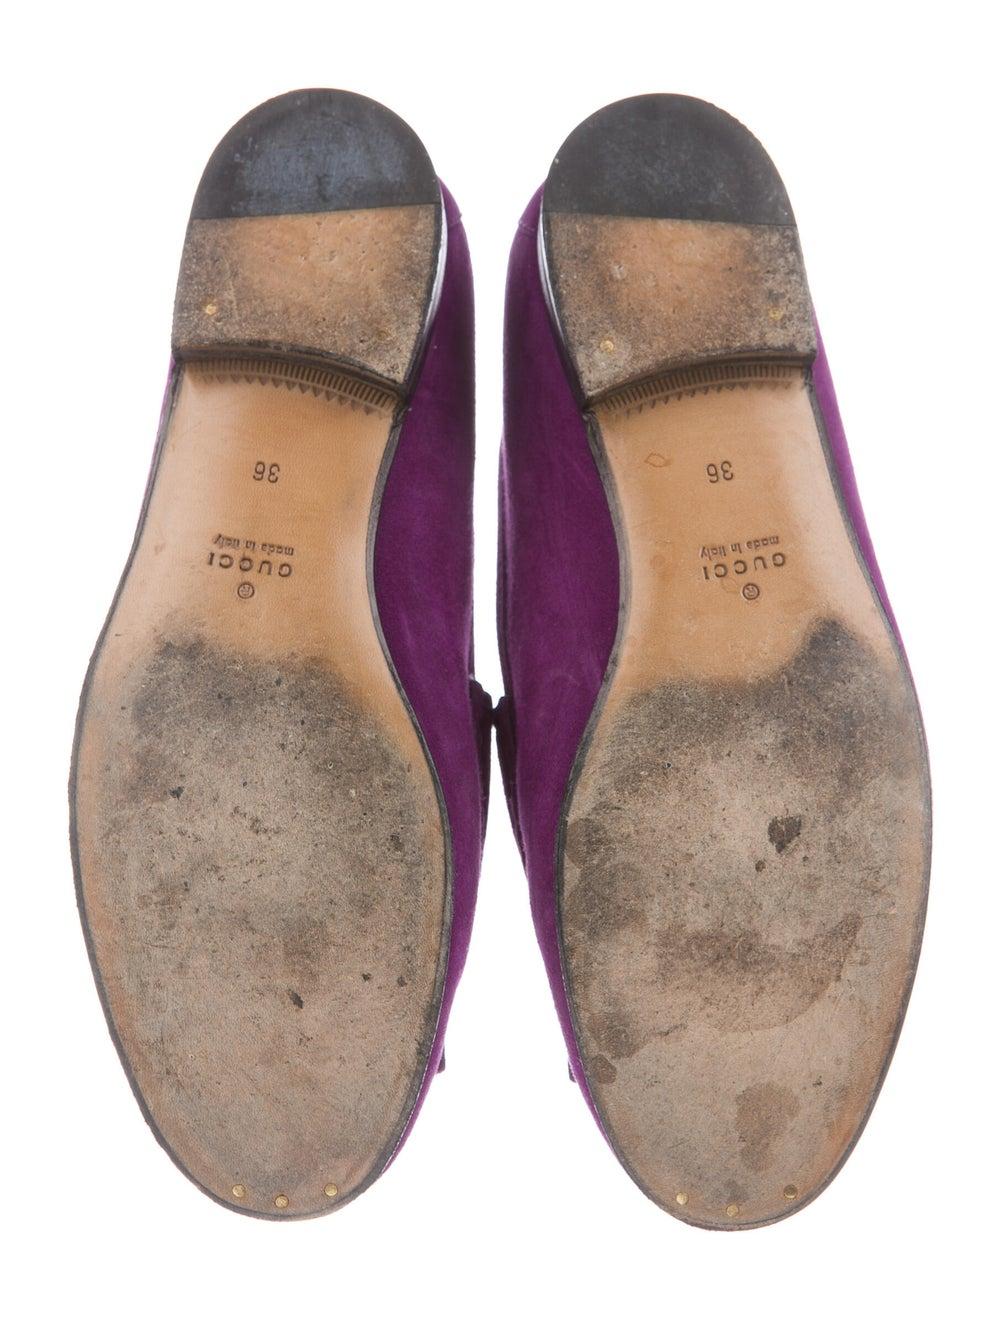 Gucci Horsebit Accent Suede Loafers Purple - image 5